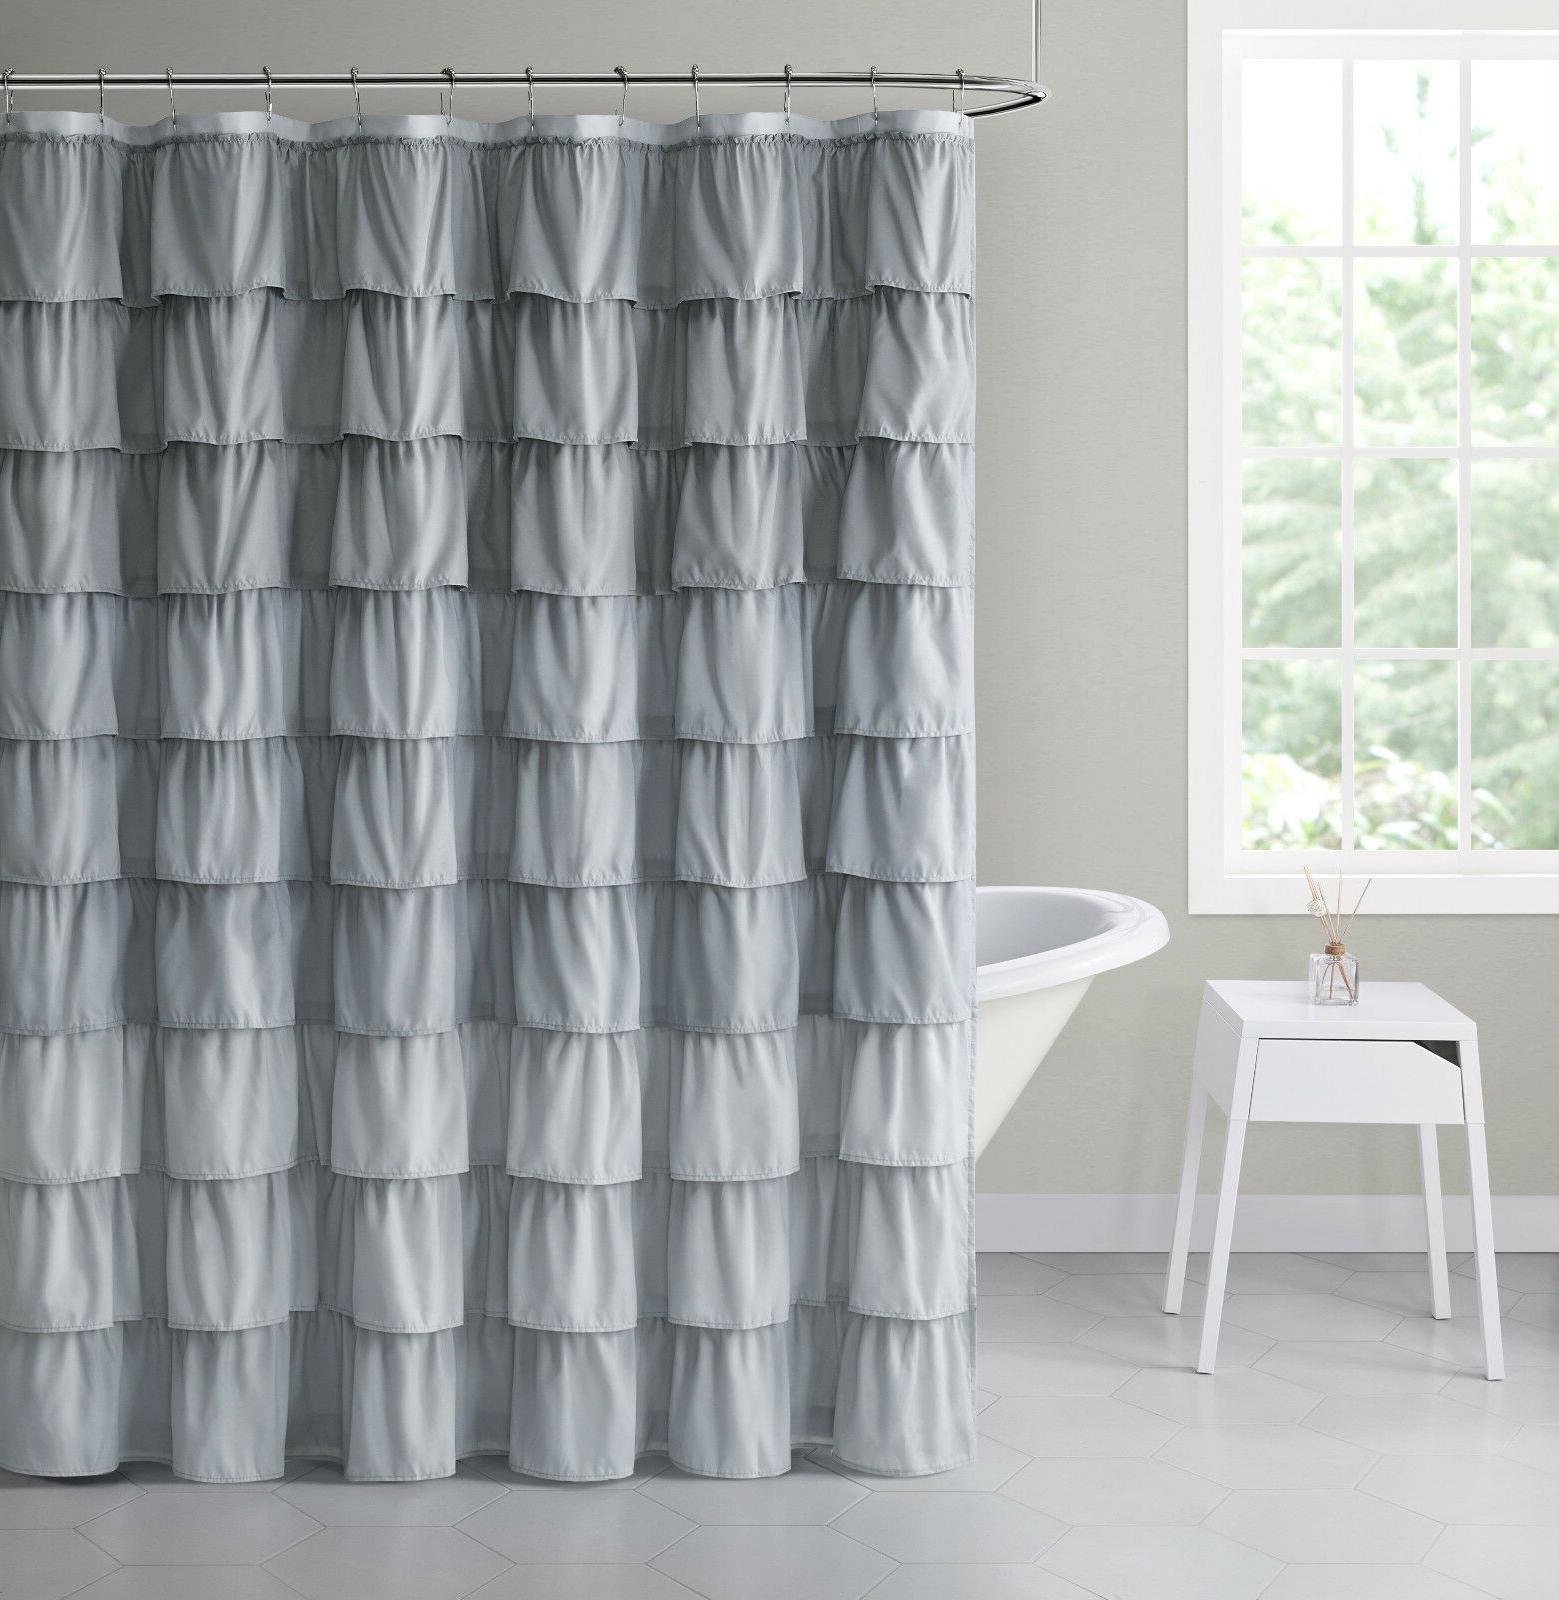 VCNY Sally Gypsy Ruffled Fabric Shower Curtain - Assorted Co